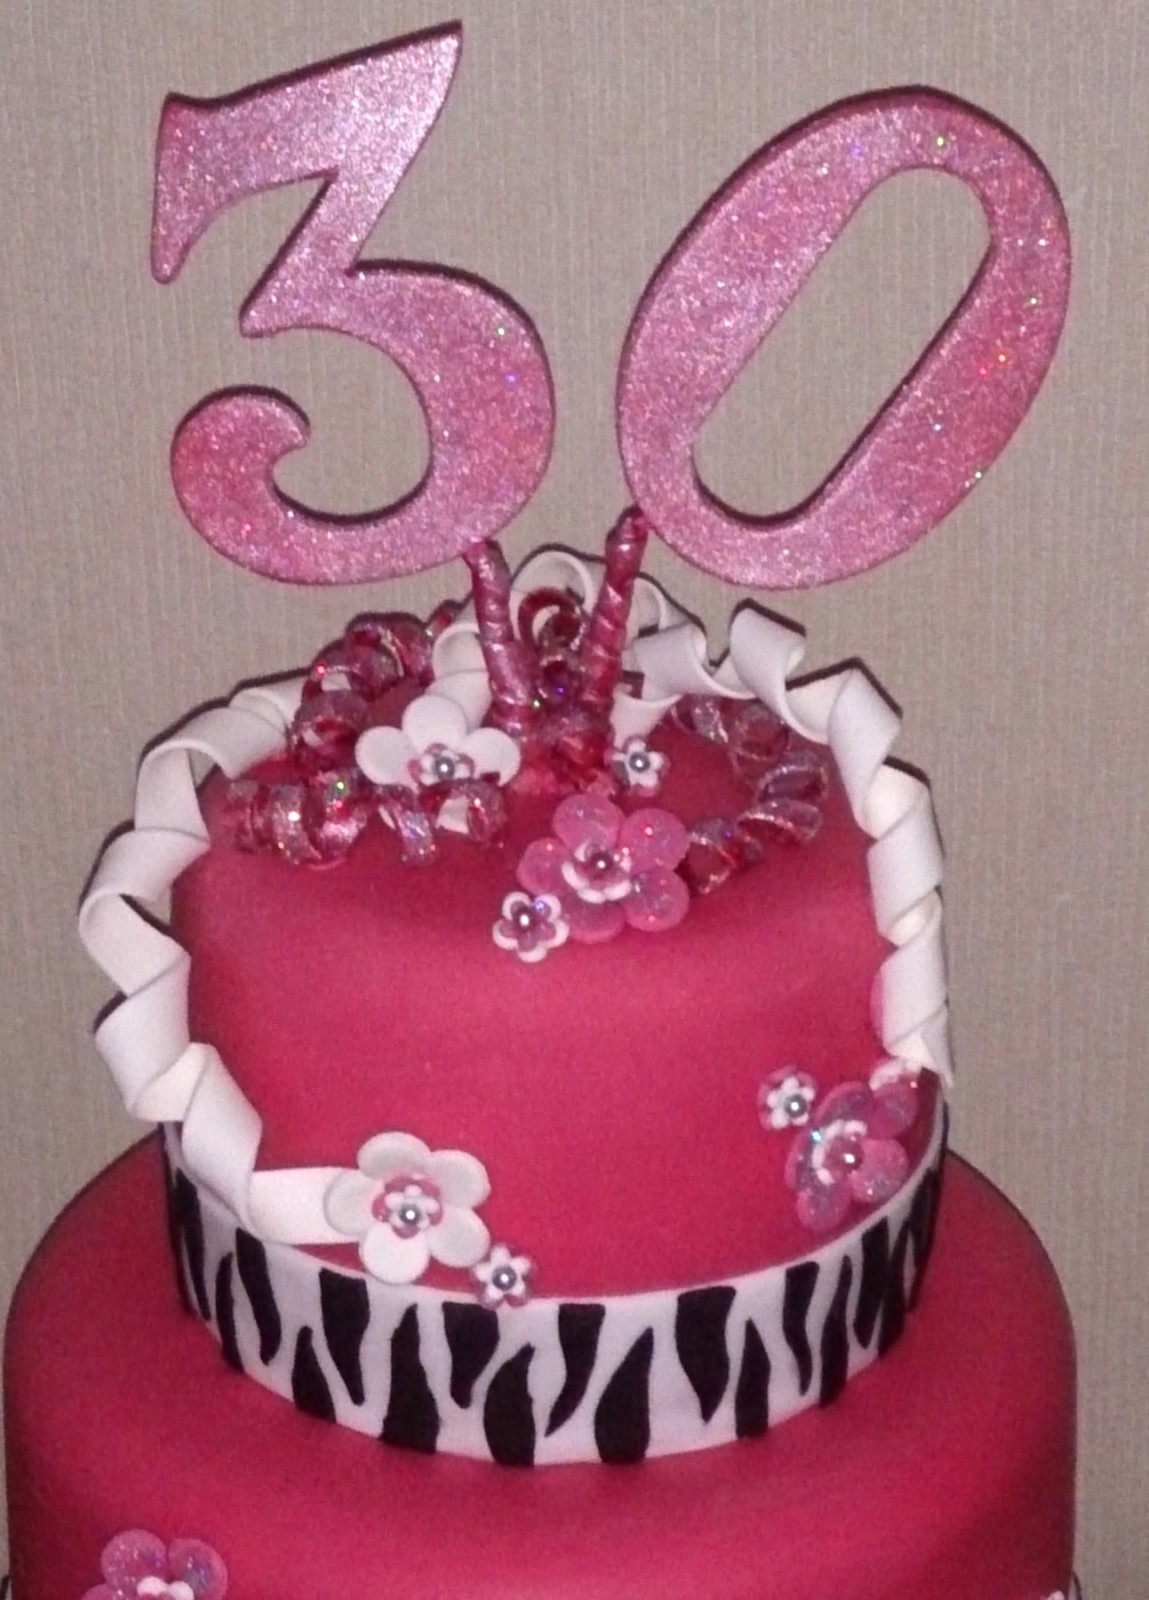 Outstanding 3 Tier Zebra Print 30Th Birthday Cake Susies Cakes Funny Birthday Cards Online Alyptdamsfinfo